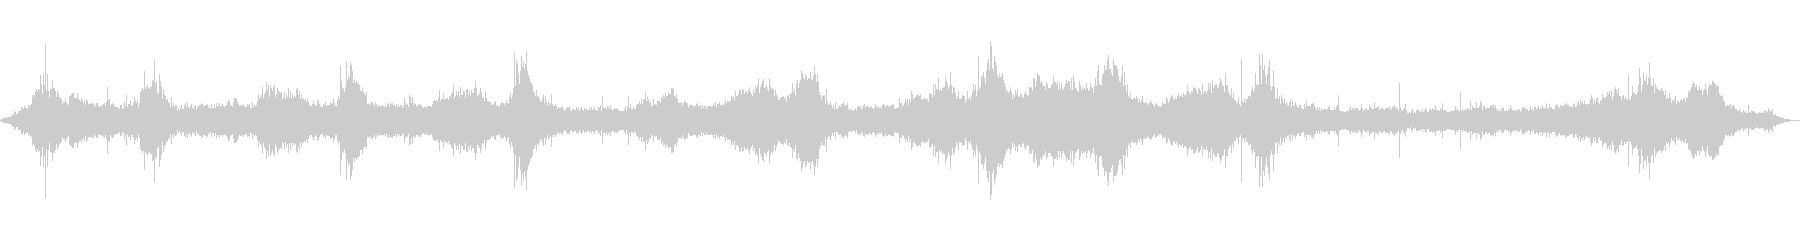 [Natural sound] Sound of wave 01 (Hachijojima)'s unreproduced waveform